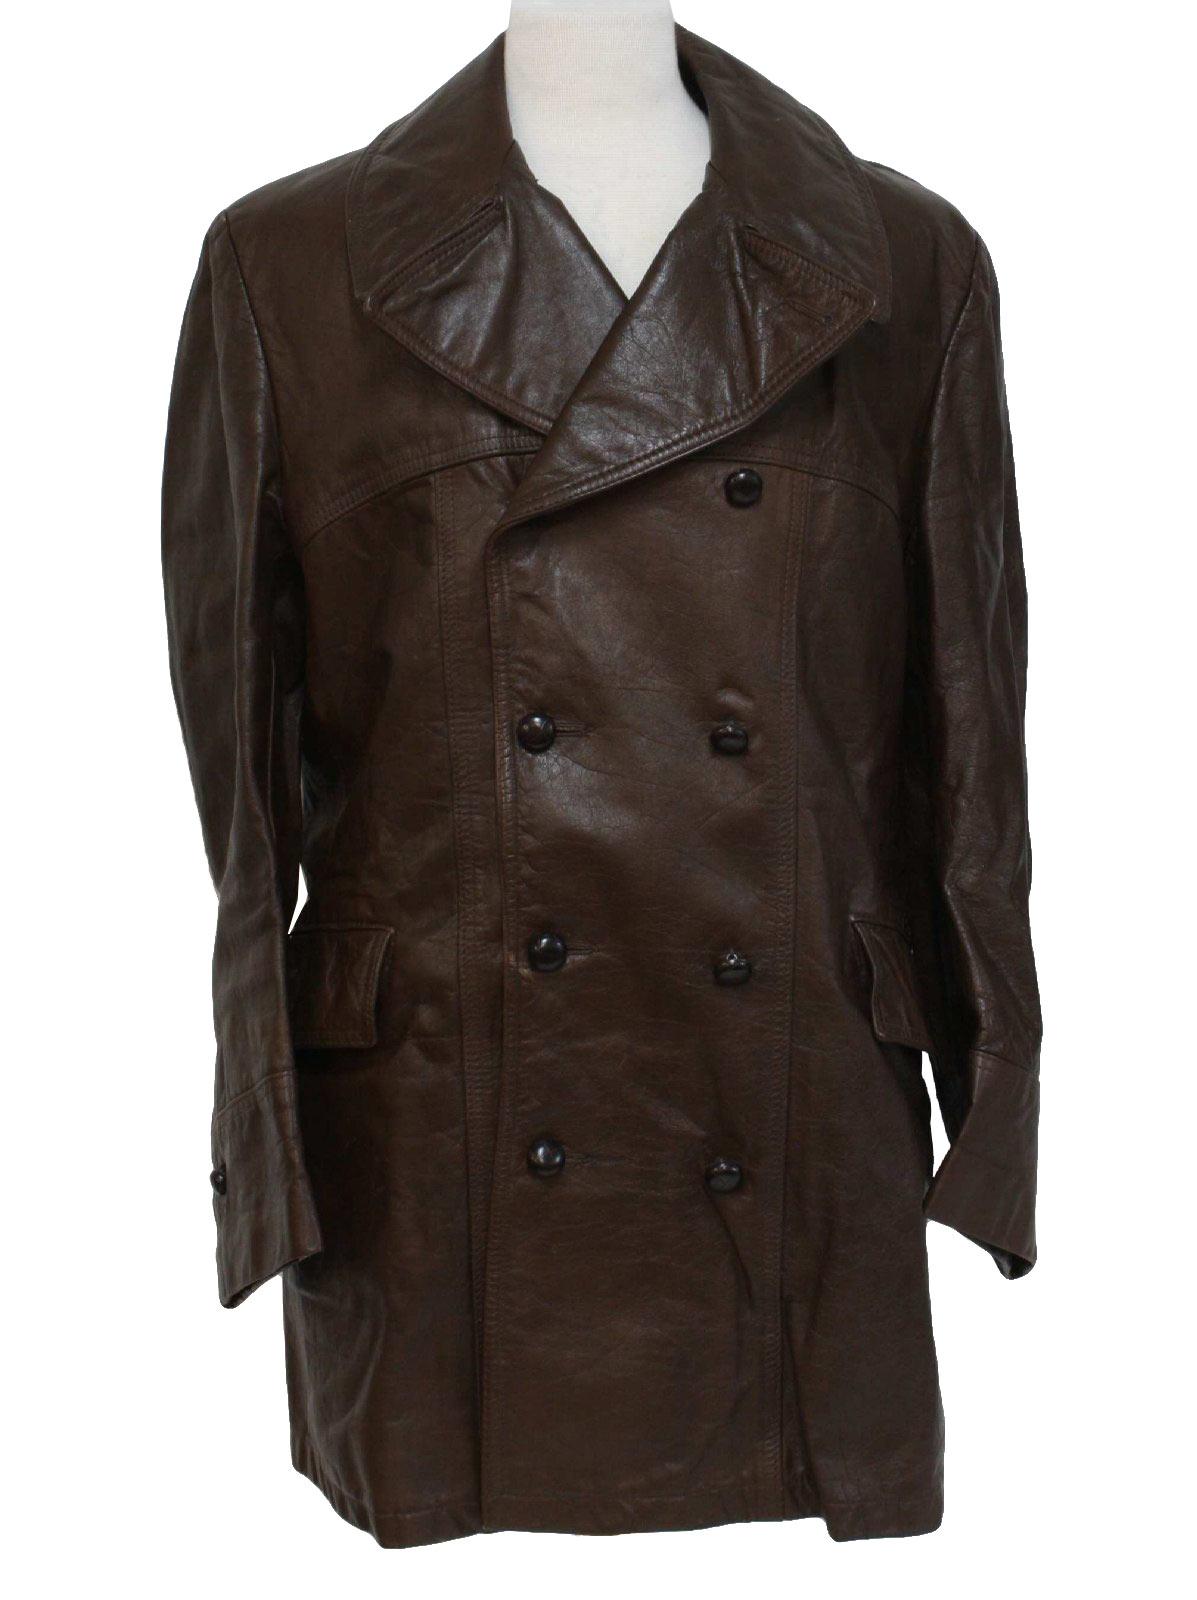 Retro 1970&39s Leather Jacket (Genuine Leather) : 70s -Genuine